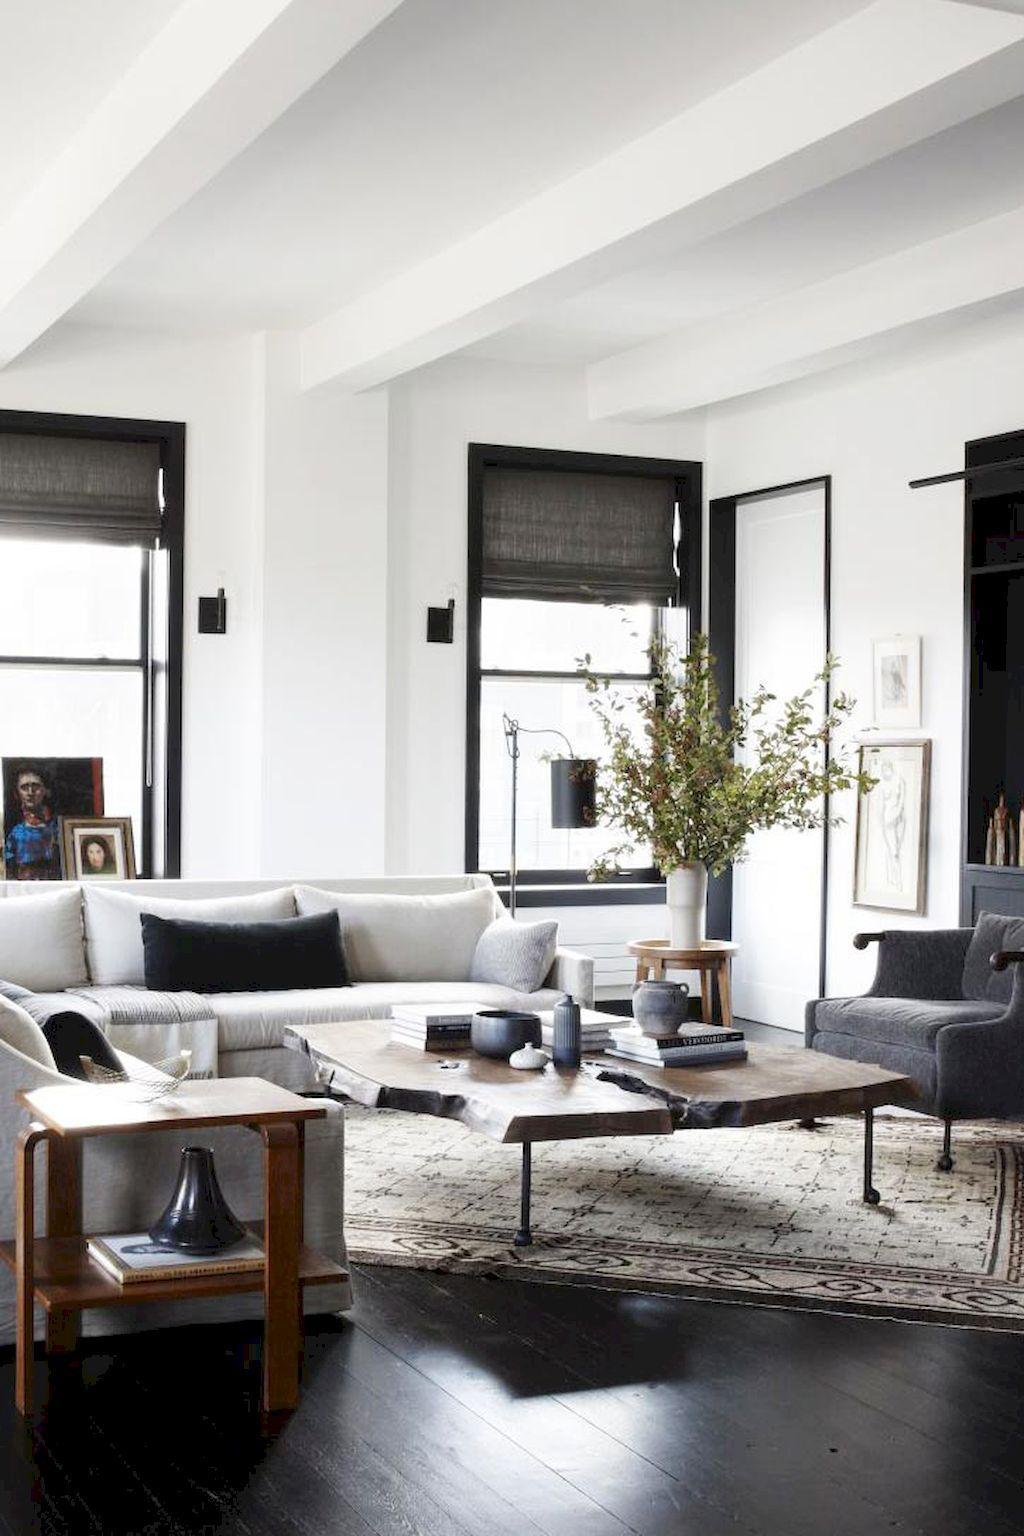 surprising industrial farmhouse living room design ideas | 25 Modern Farmhouse Living Room First Apartment Ideas ...